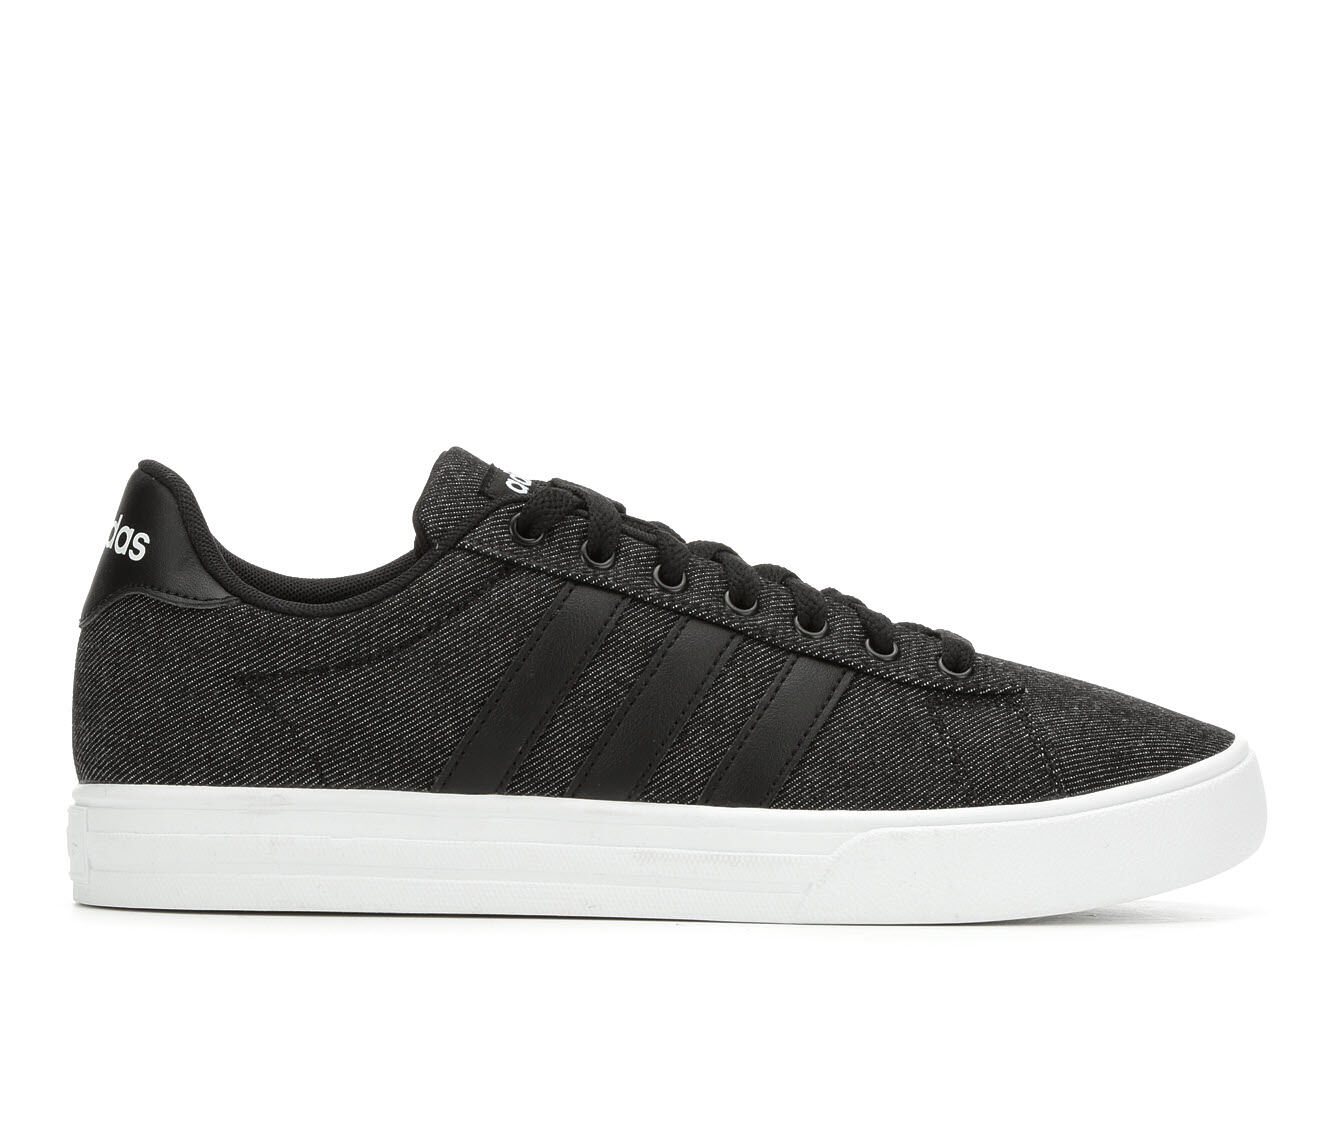 Men's Adidas Daily 2.0 Skate Shoes